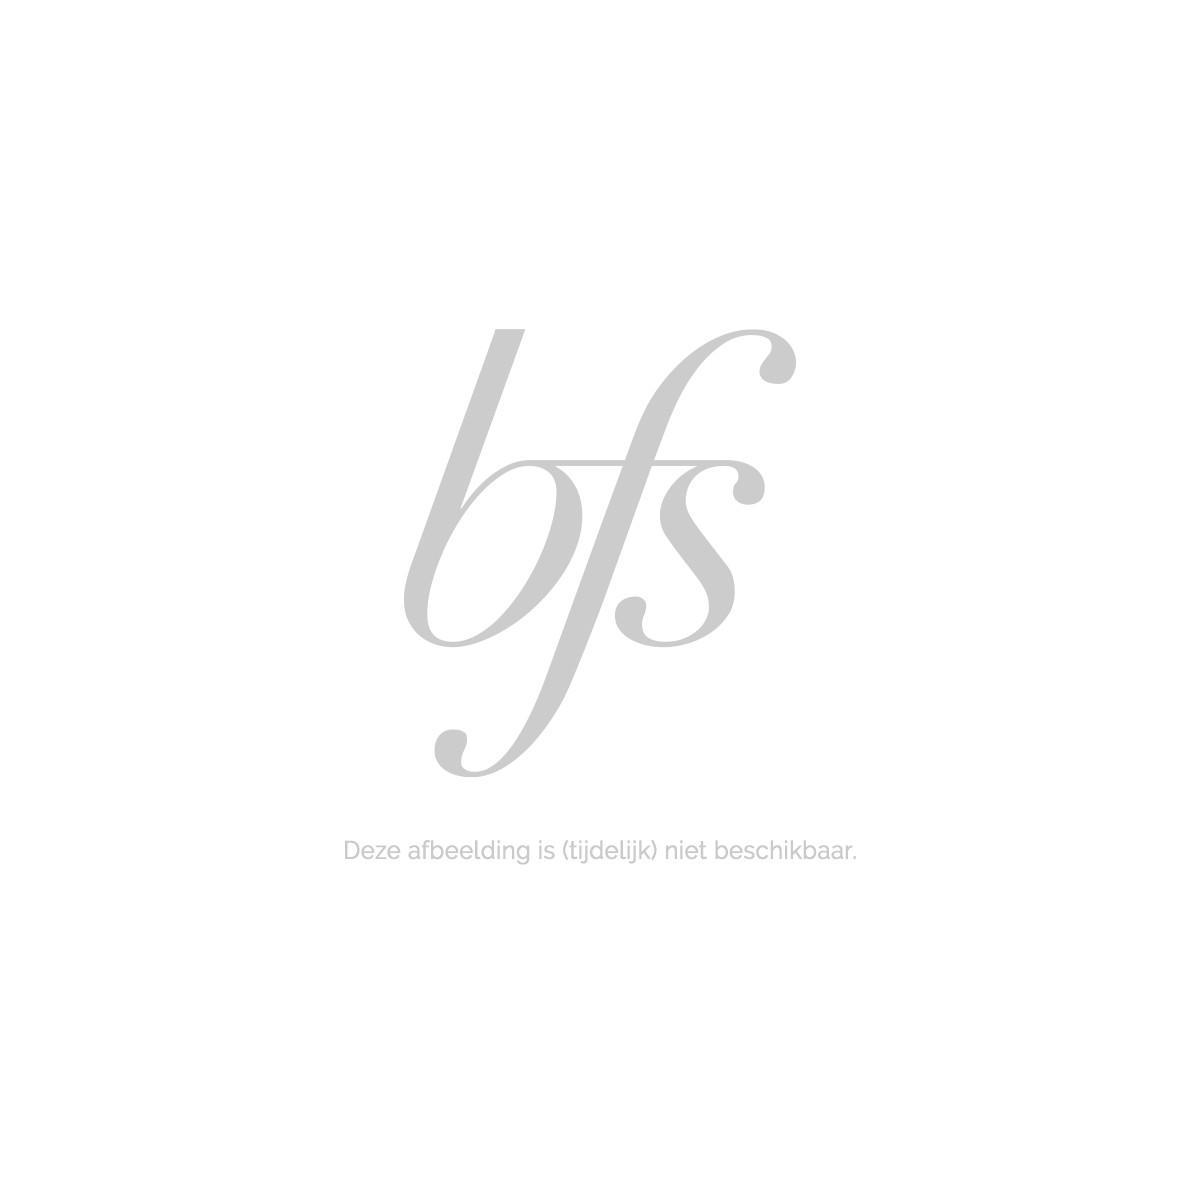 Christian Dior Diorific Long-Wearing True Colour Lipstick 3,50 Gr